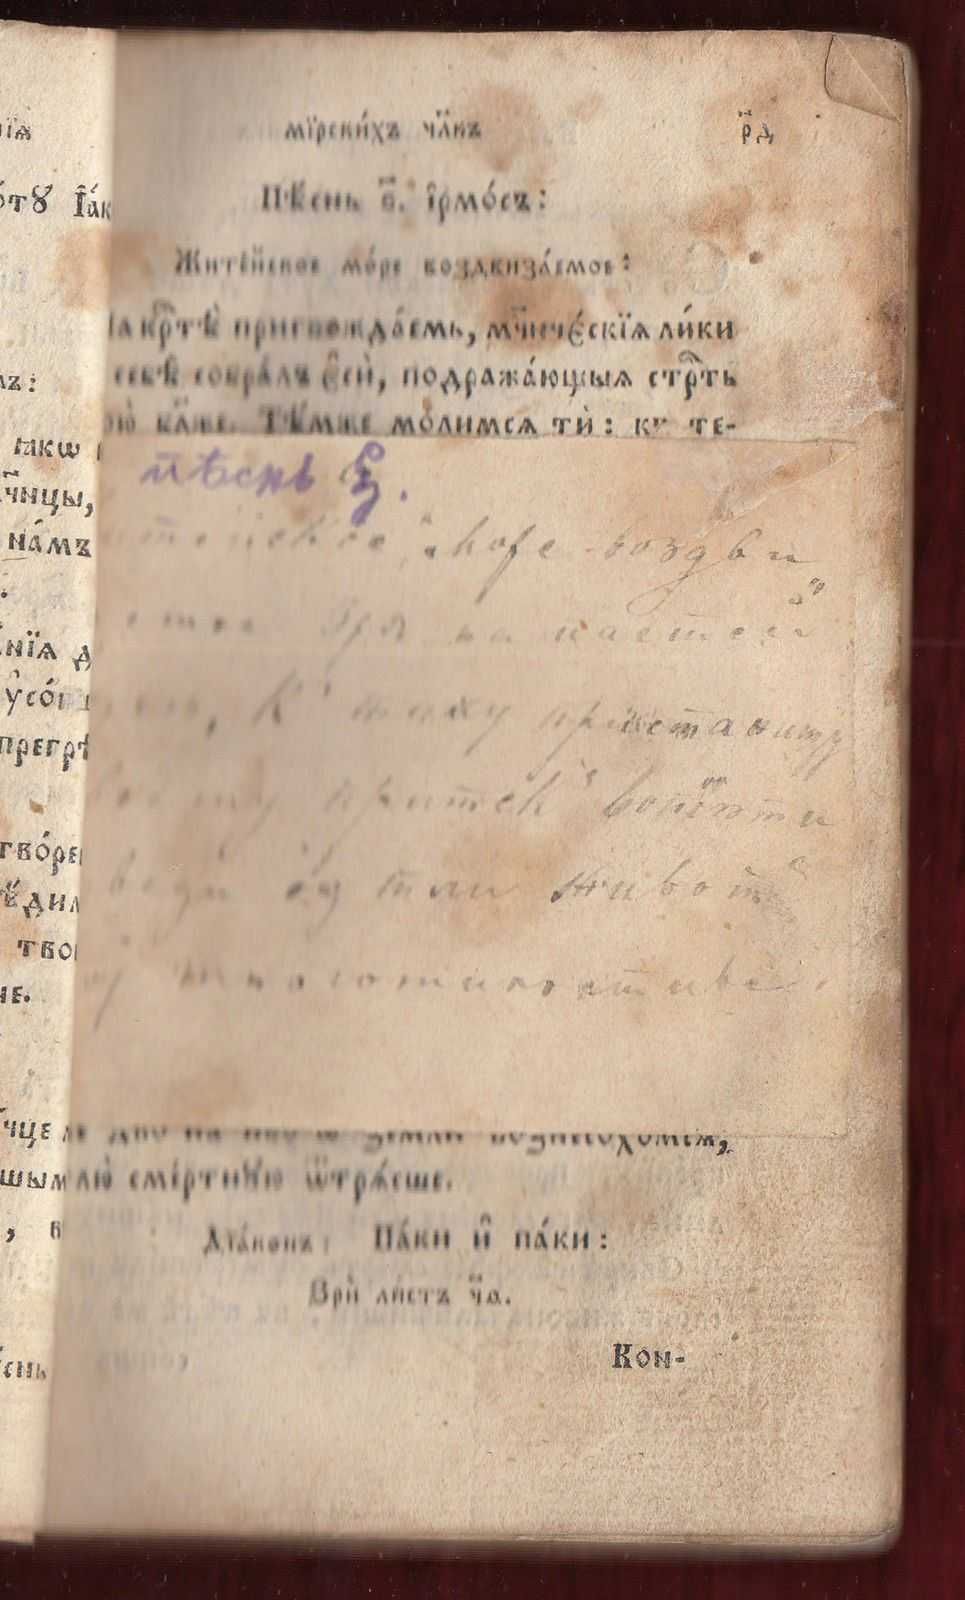 19c-Posledovanie-Acolouthia-e-Old-Slavonic-Inscribed-Manuscript-401146479031-4